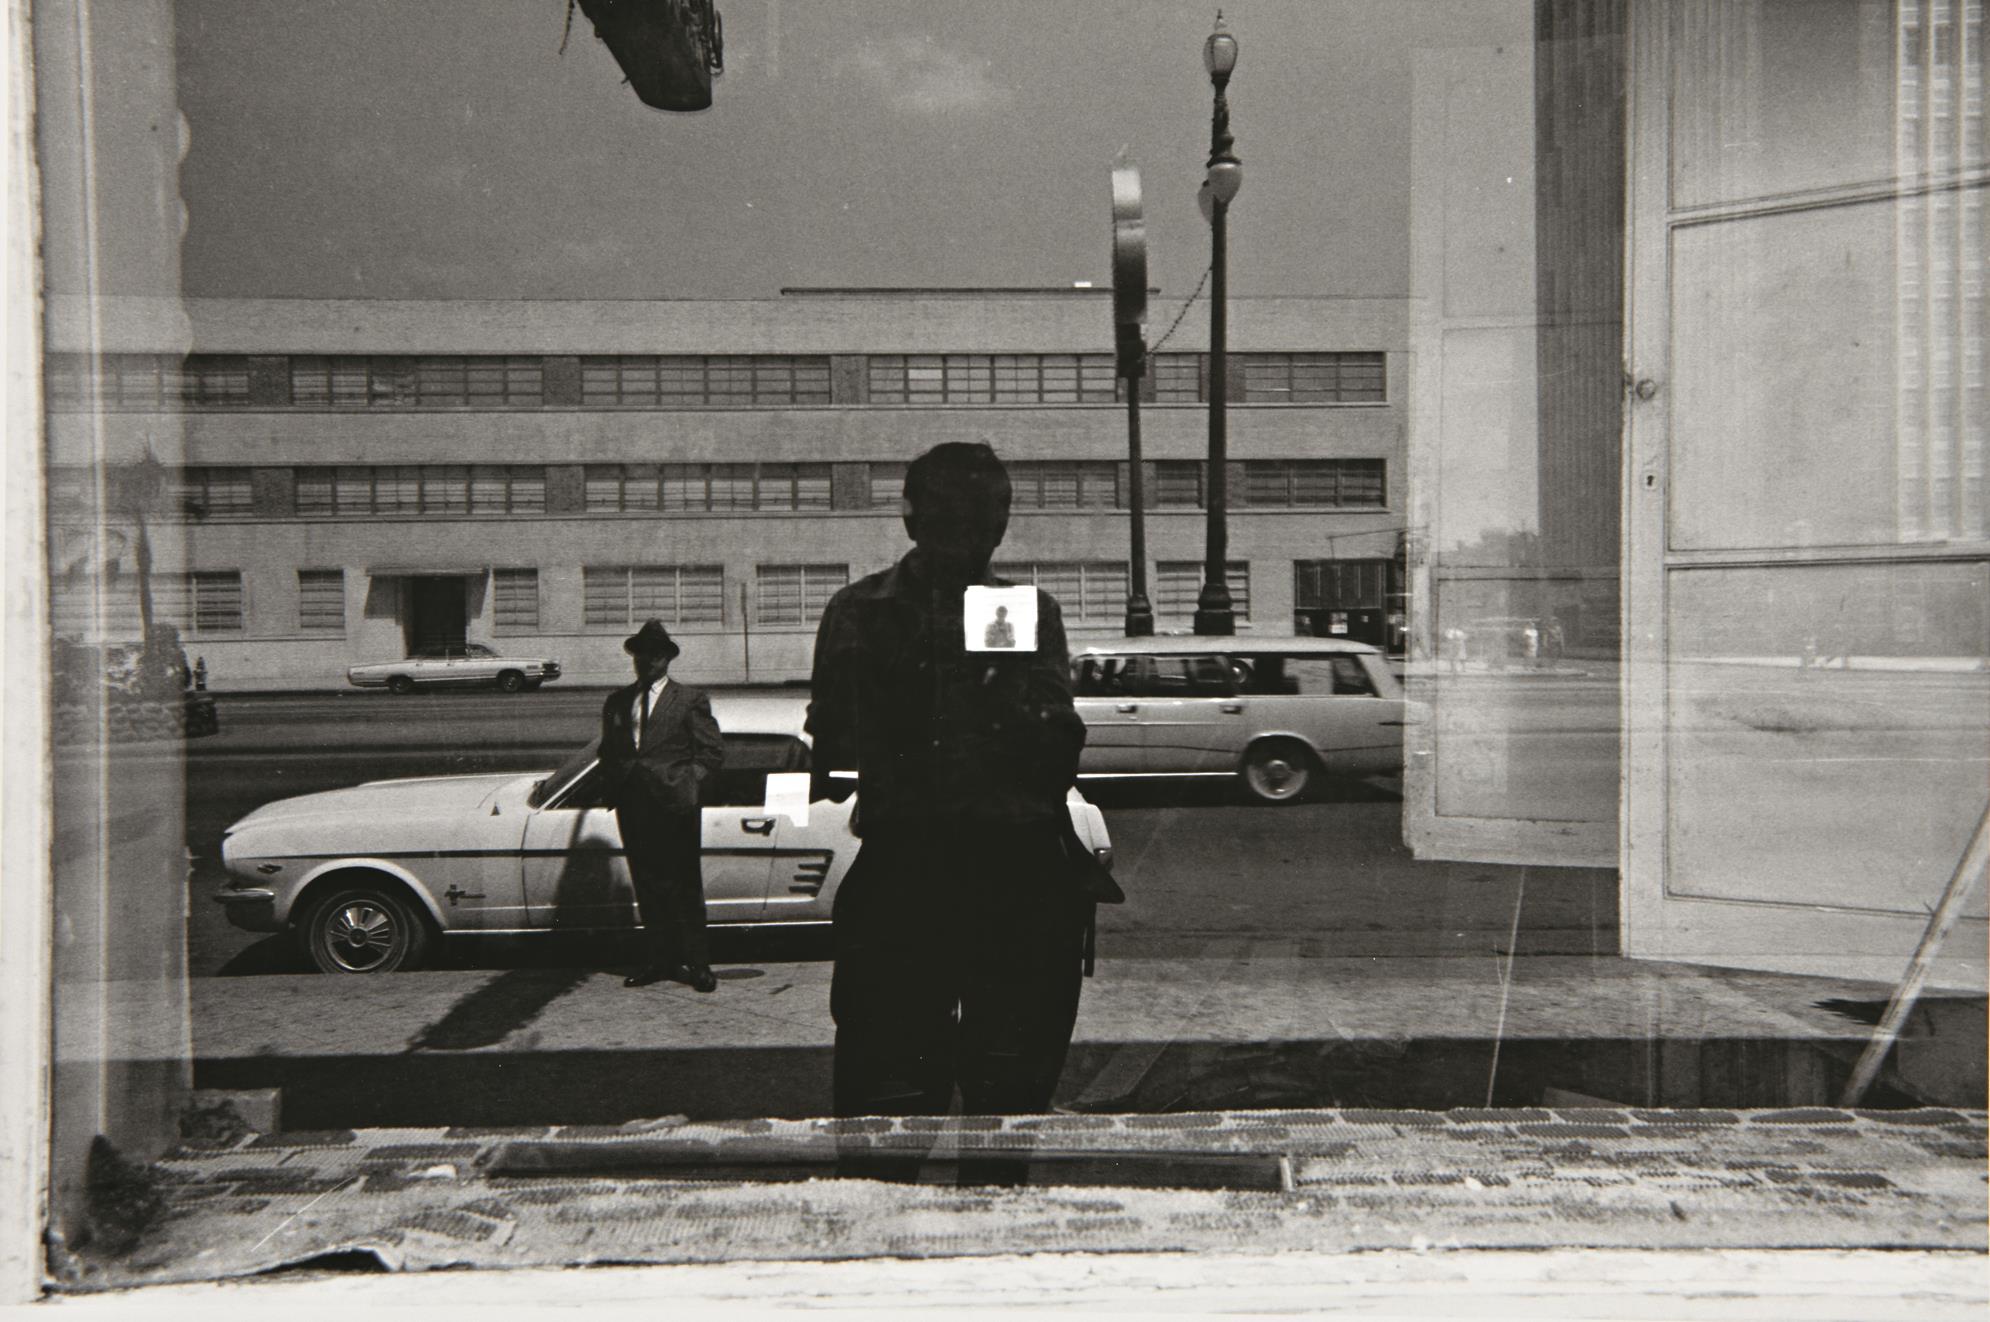 Robert frank photo essays